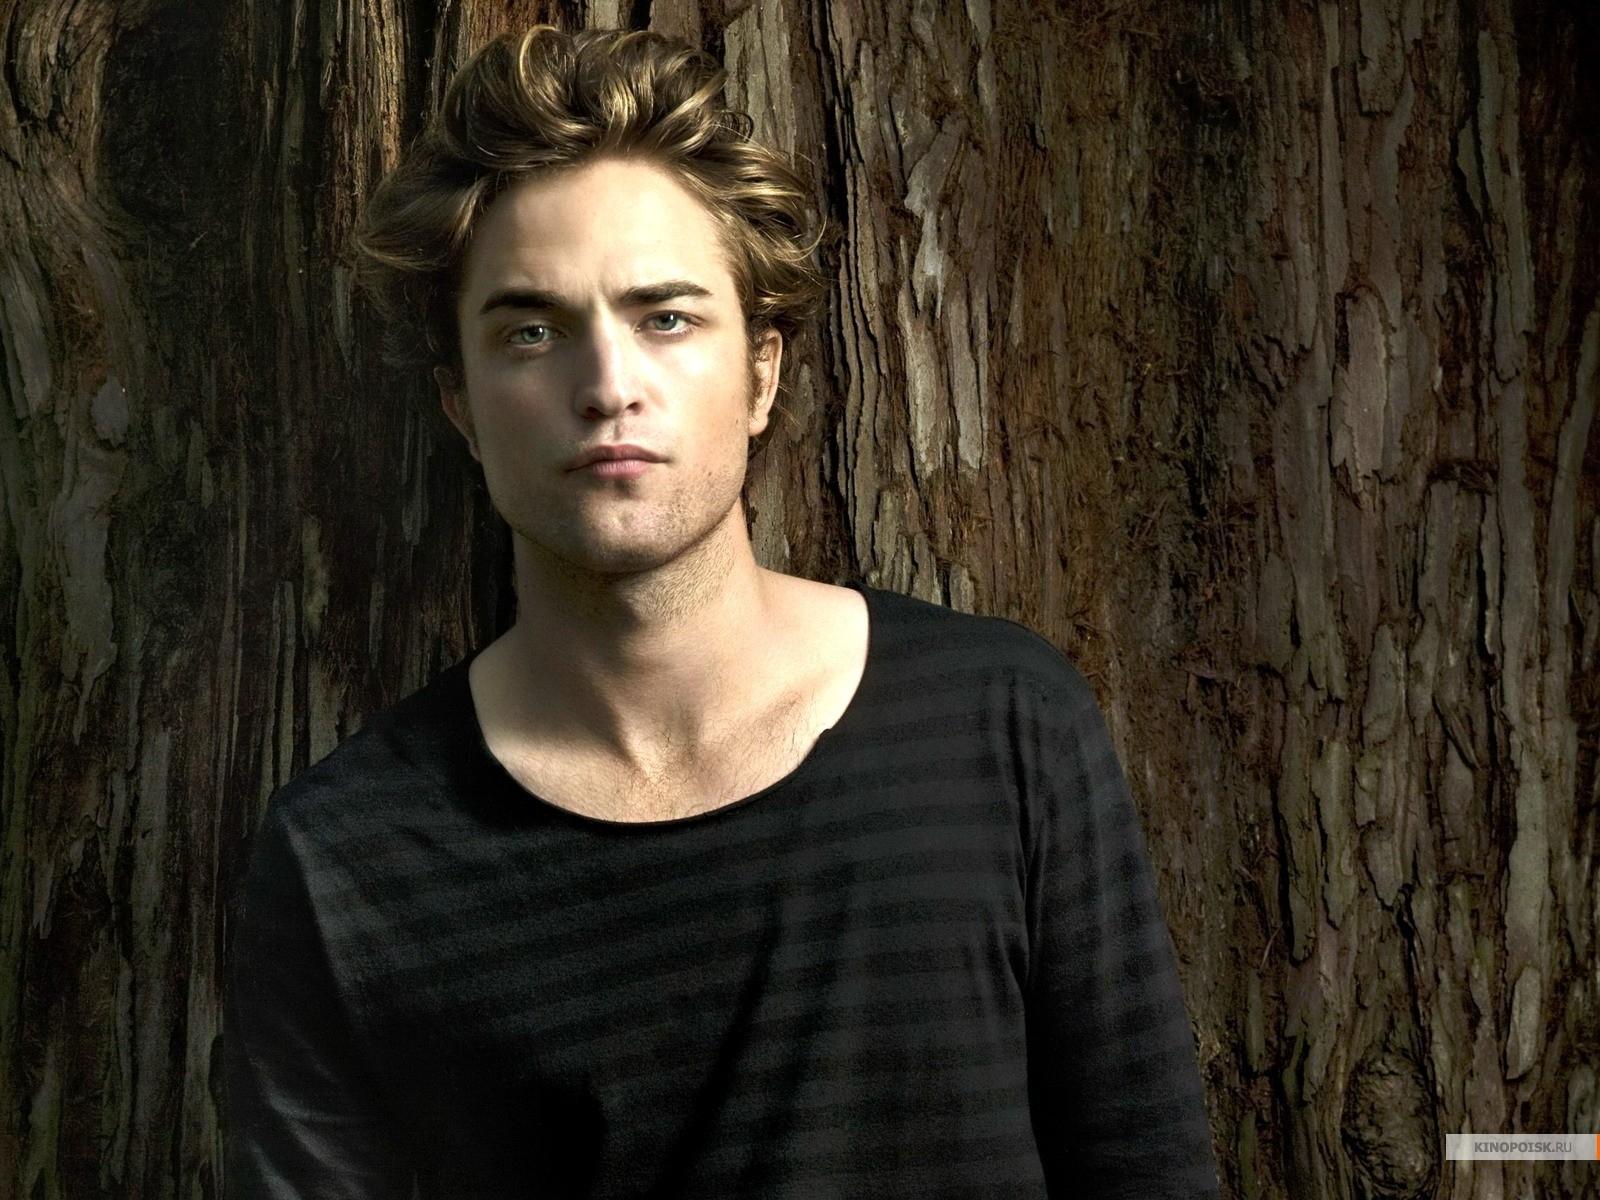 Download mobile wallpaper Twilight, Robert Pattinson, People, Cinema, Men, Actors for free.